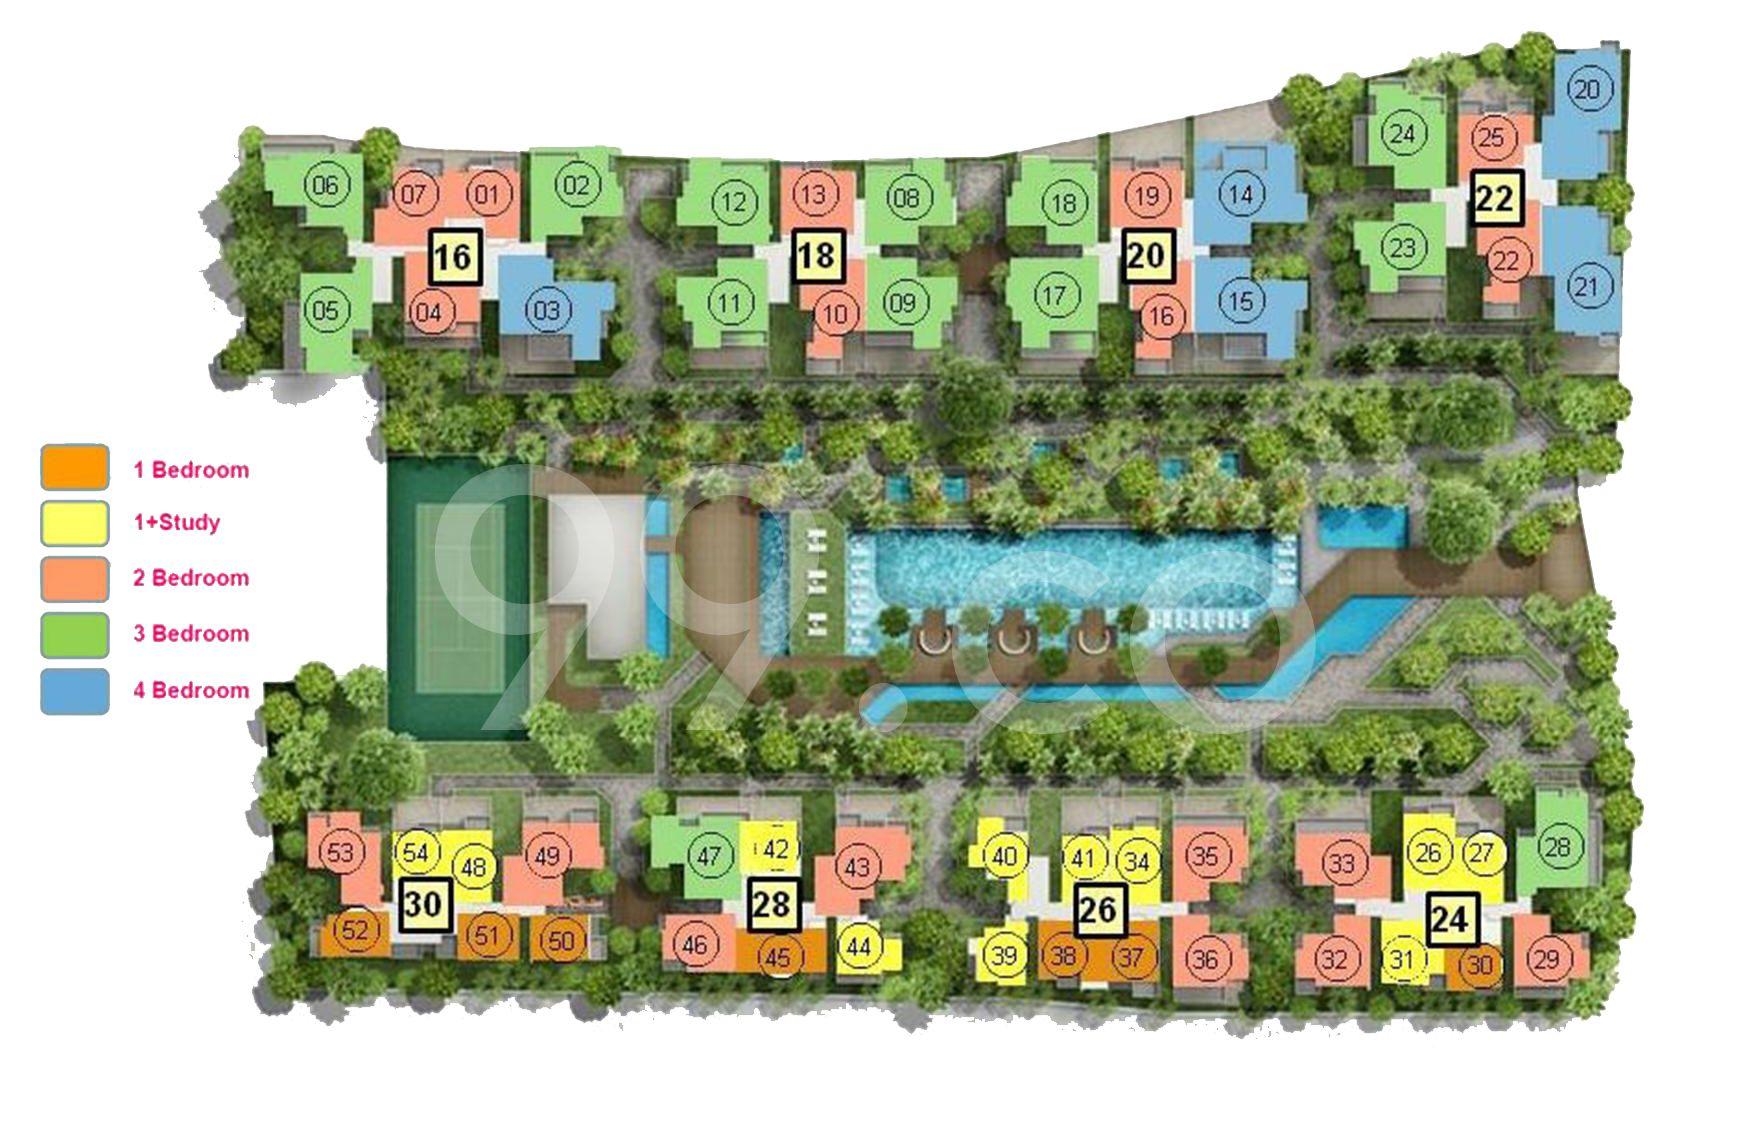 Bedok Residences Condo Prices Reviews Property 99 Co